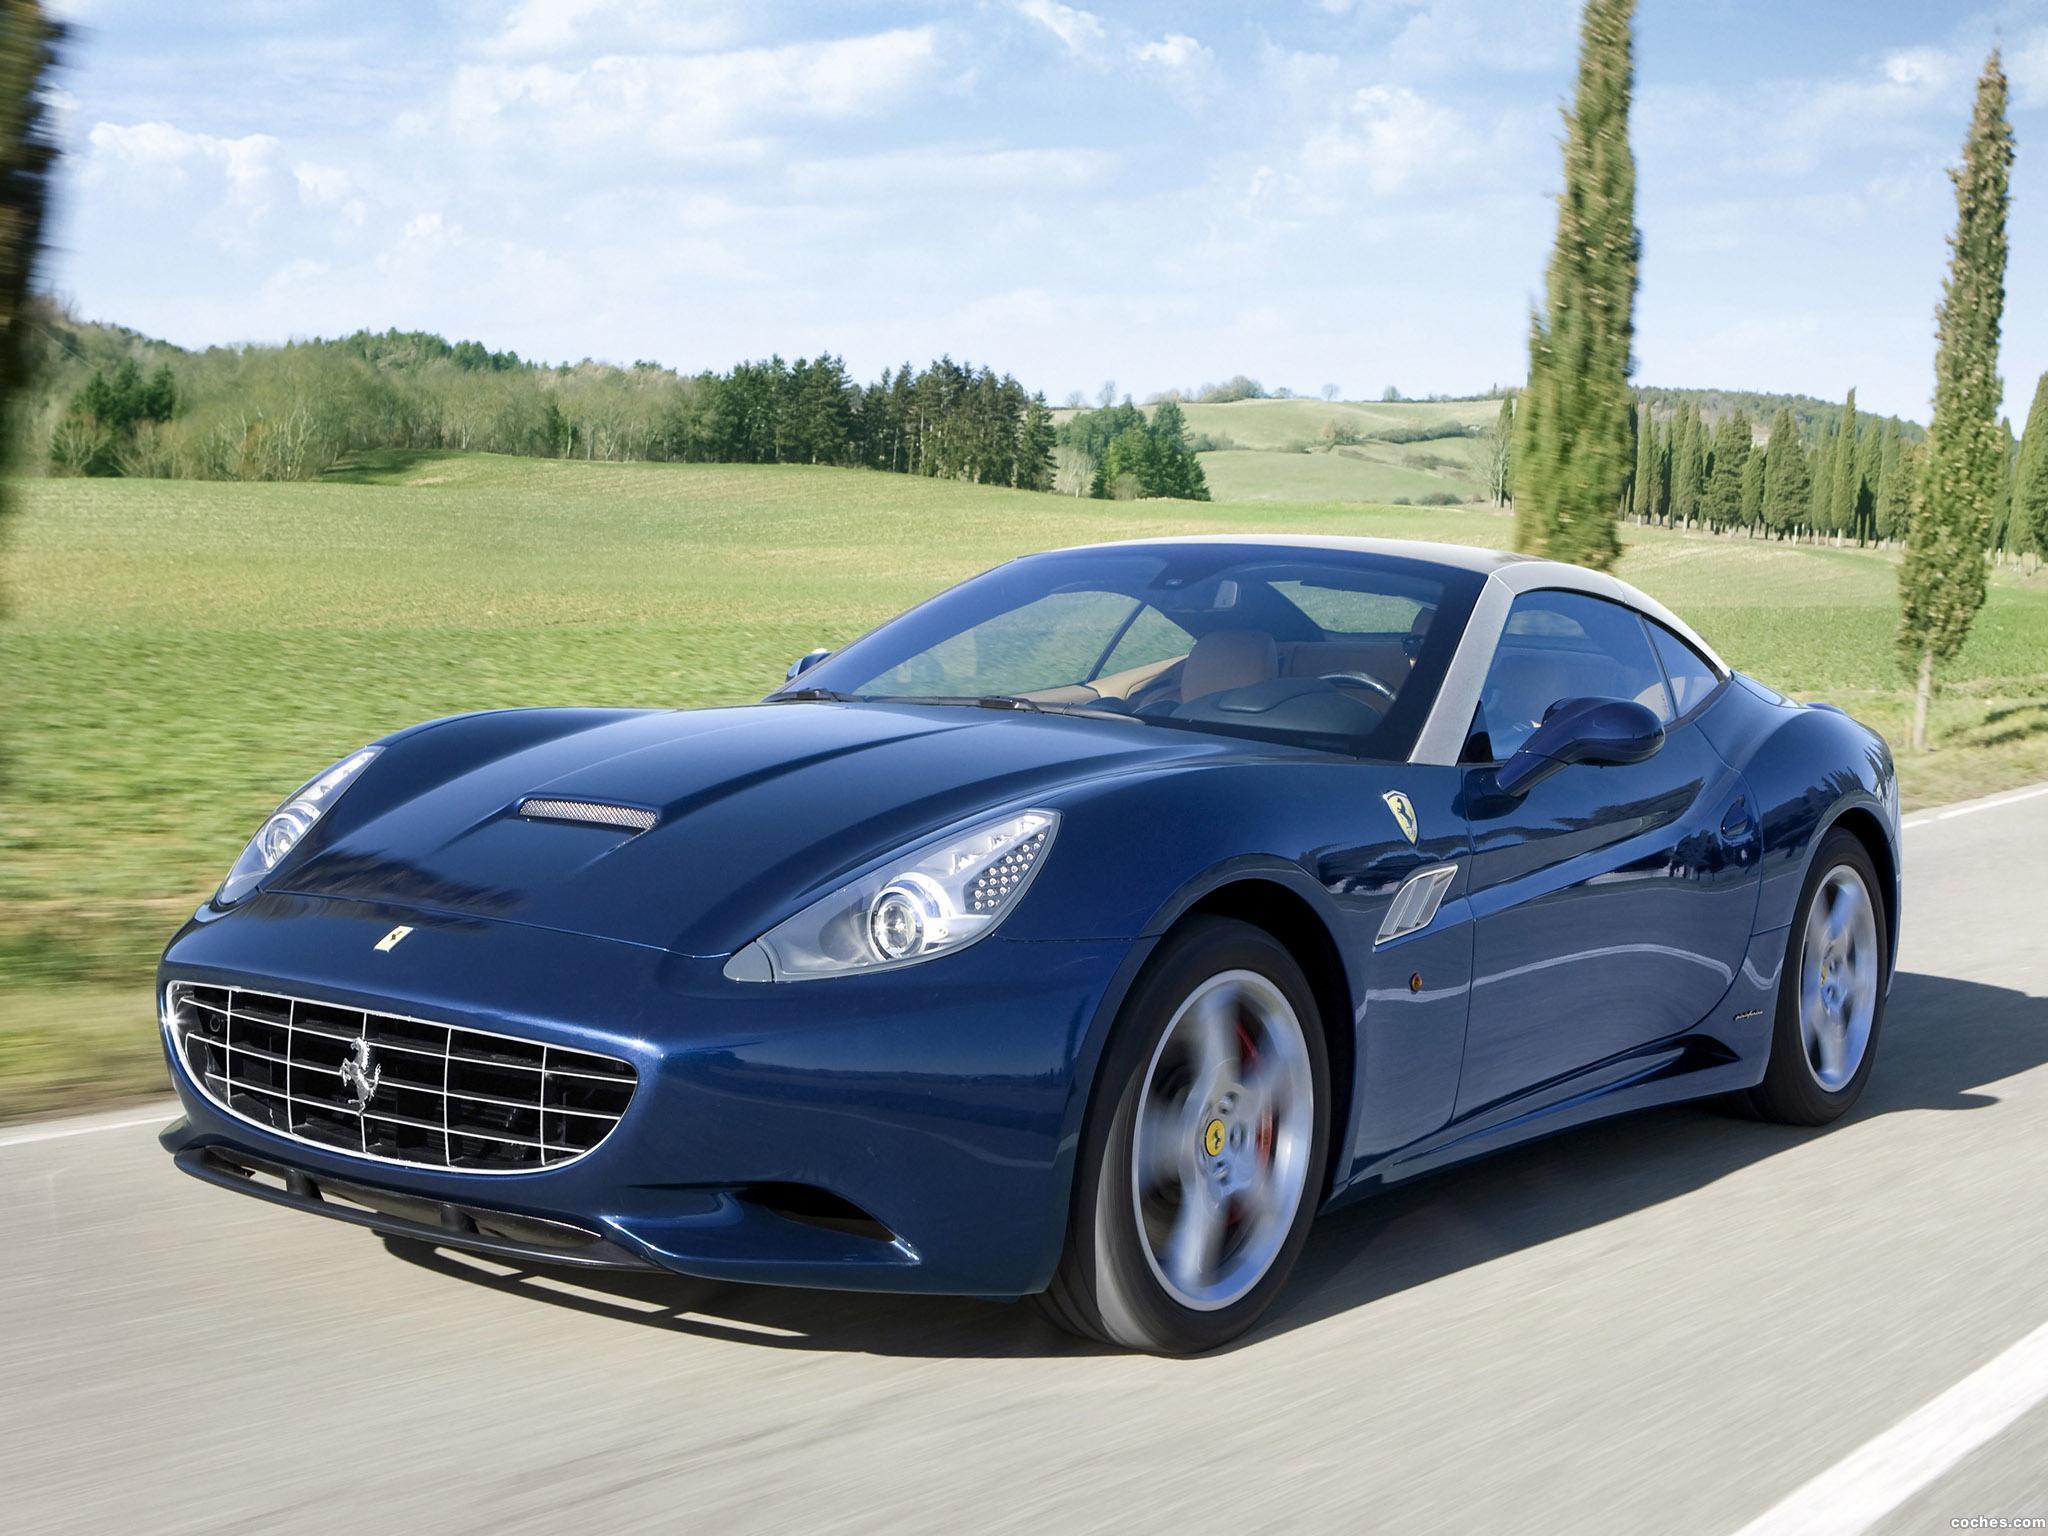 Foto 1 de Ferrari California HS Package 2012